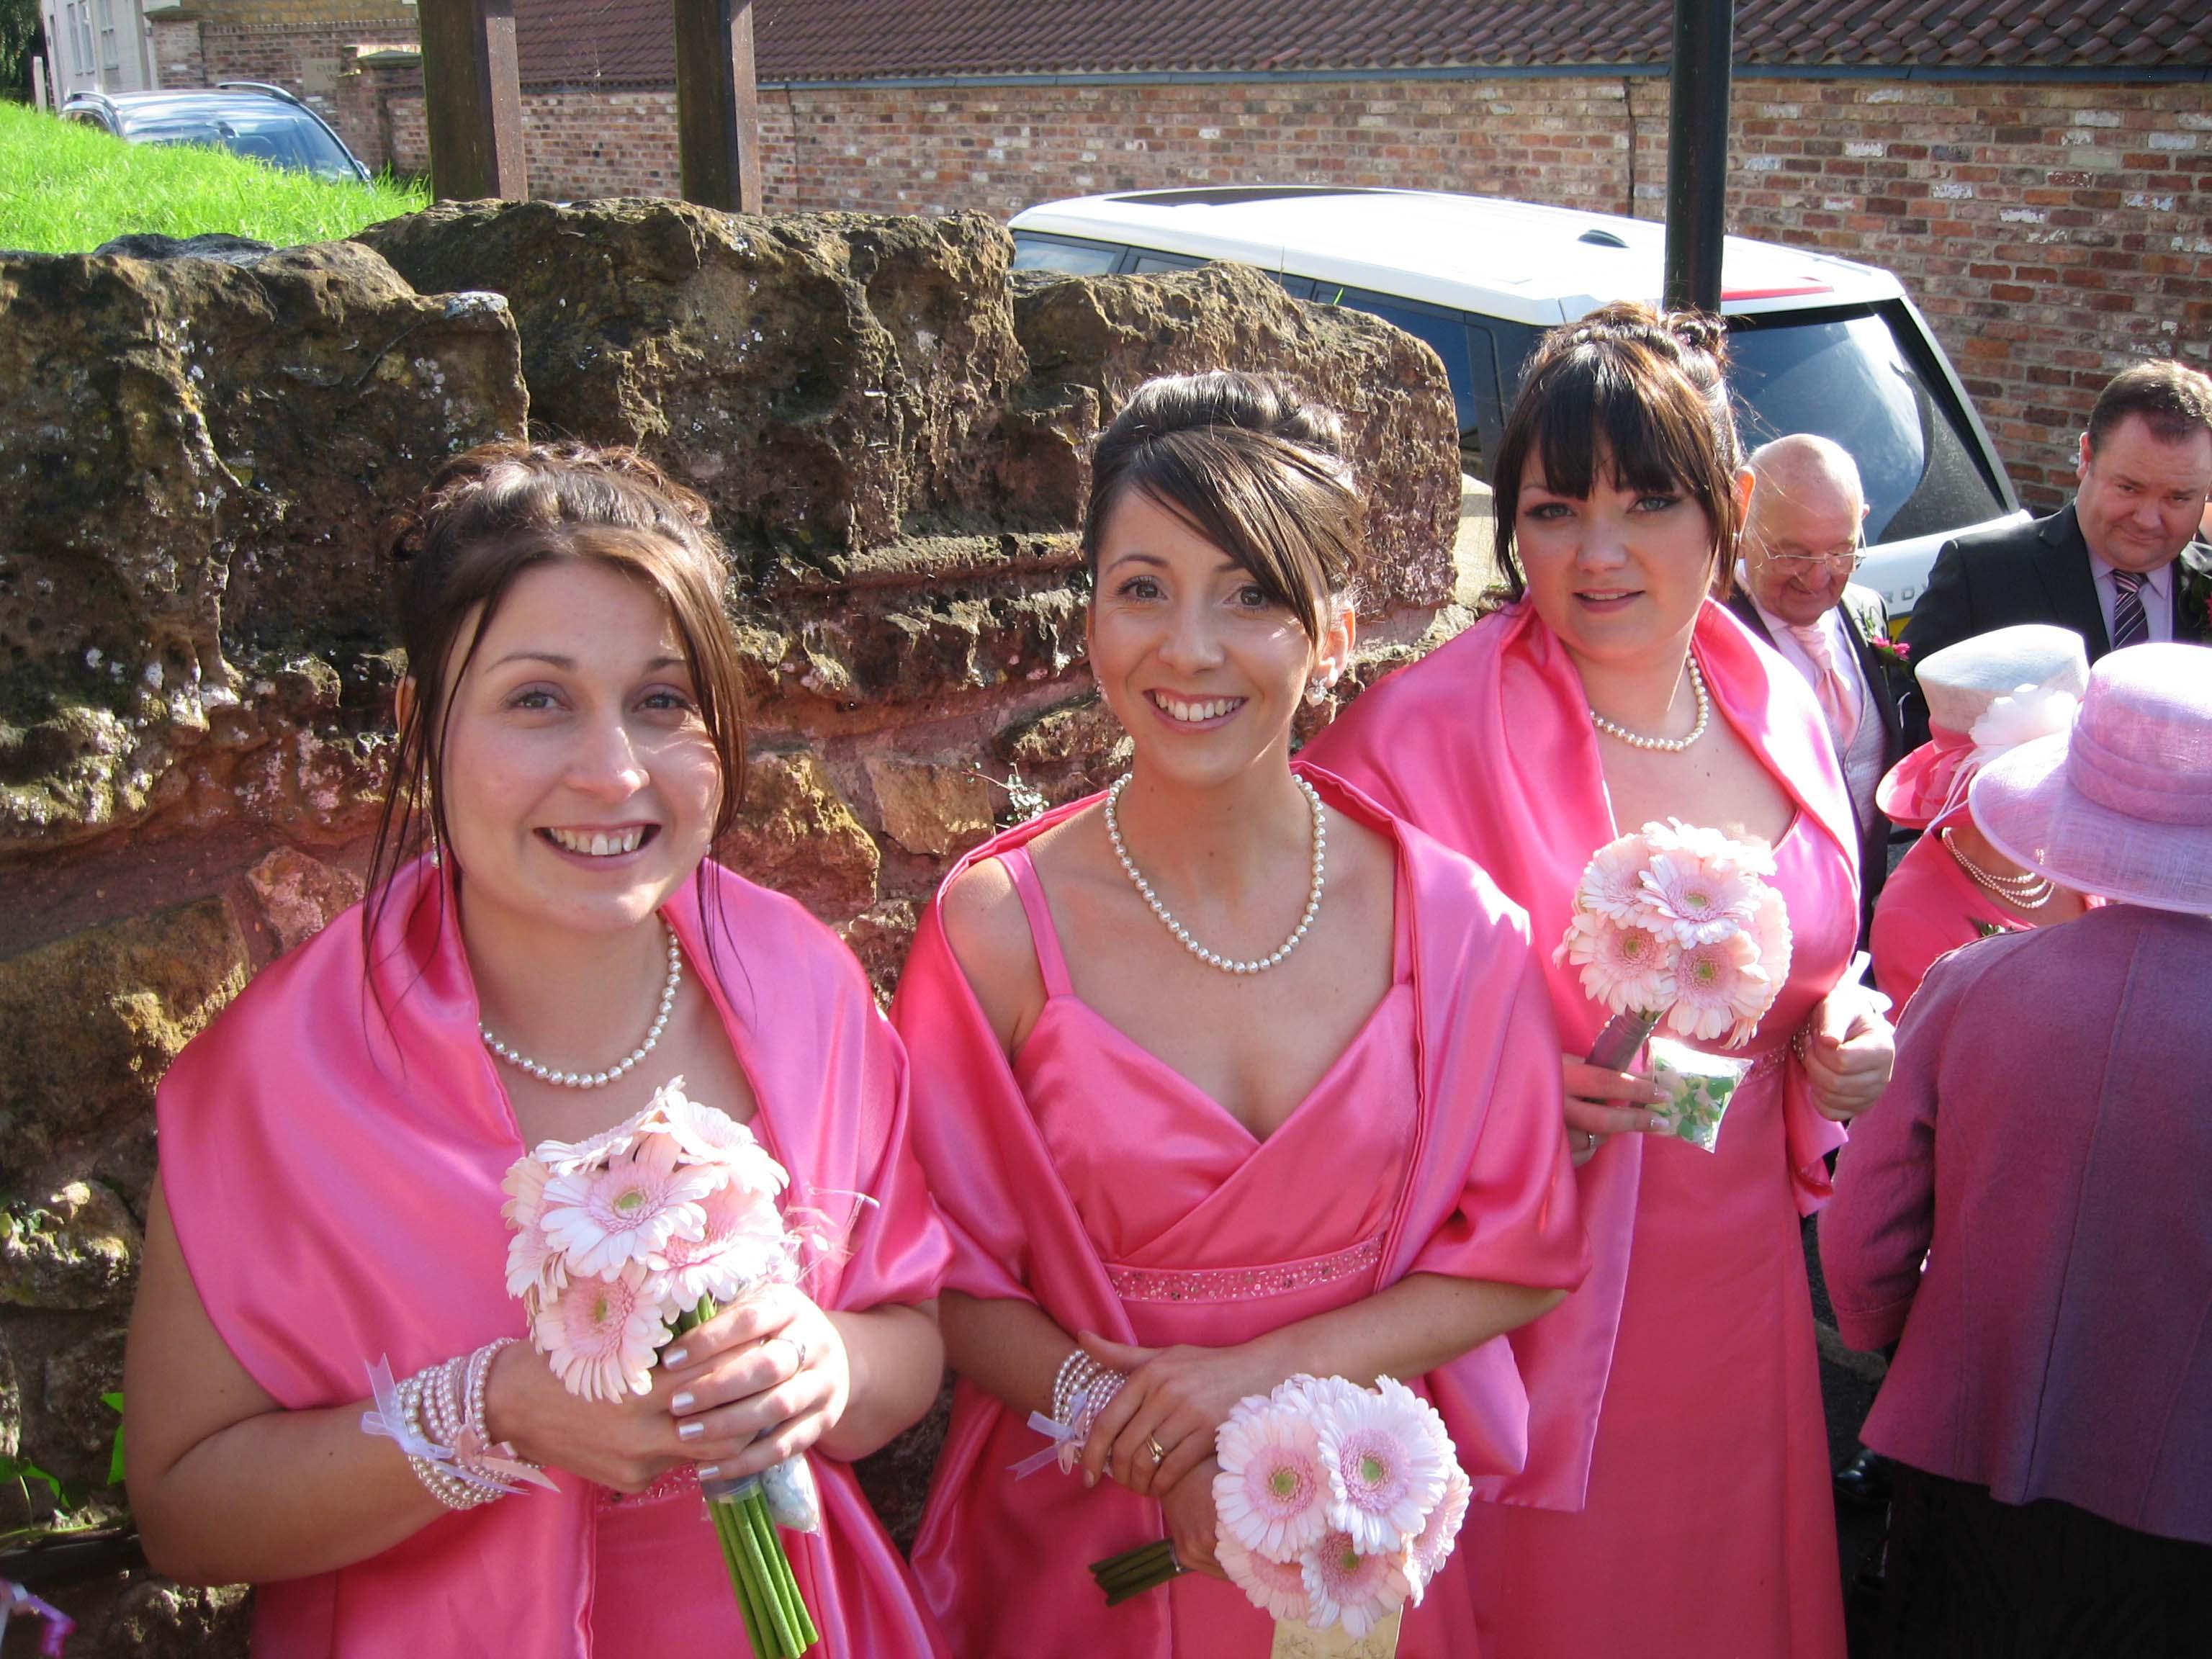 Bespoke pink bridesmaids dresses